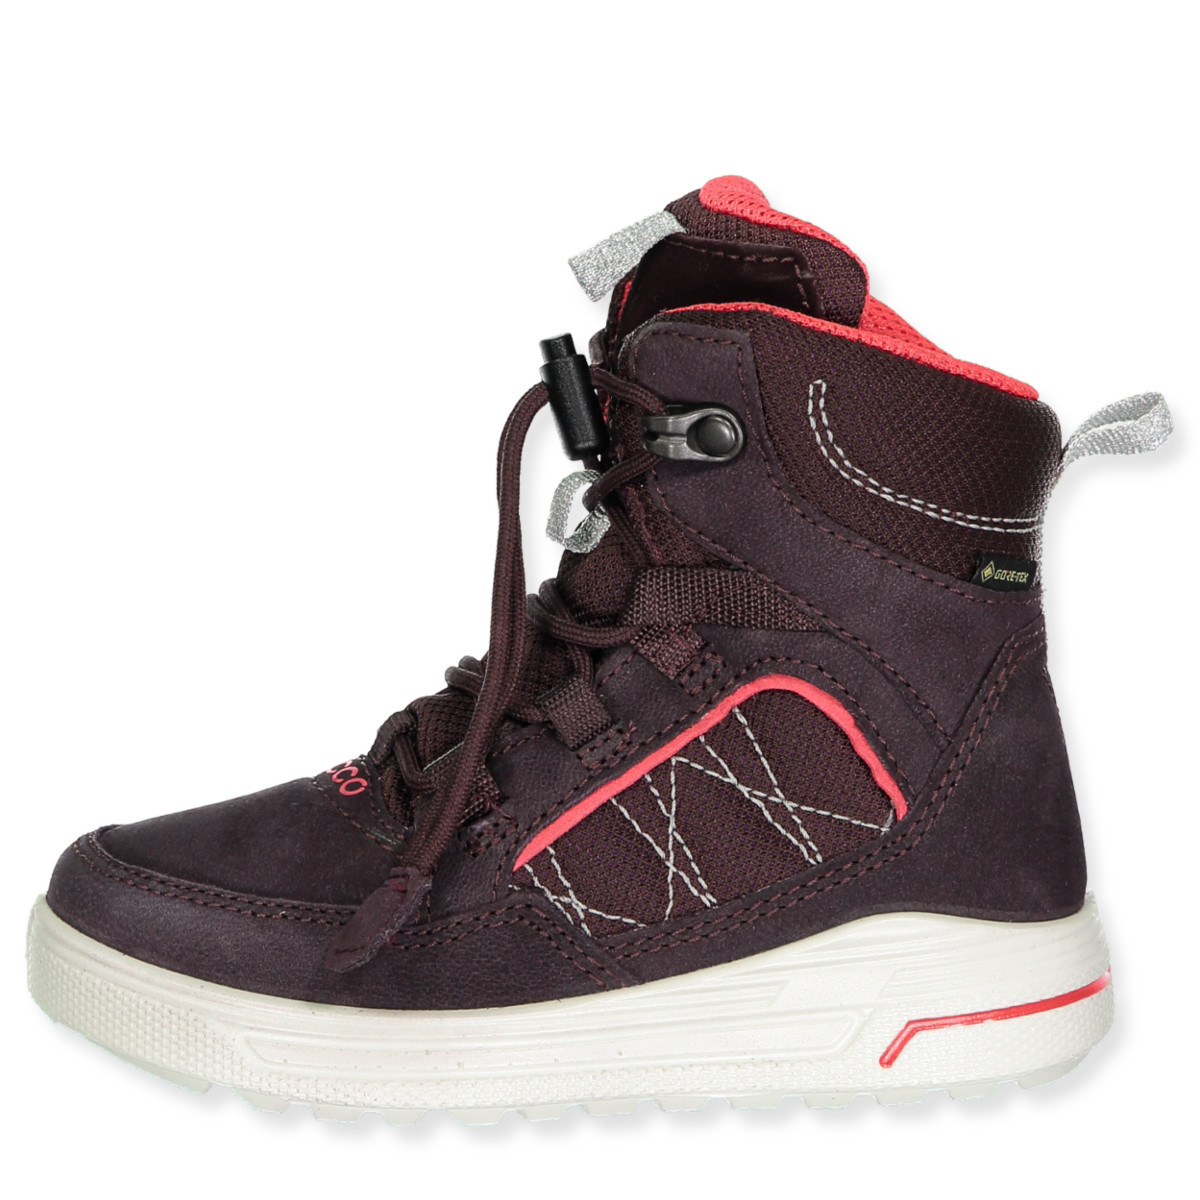 Ecco Urban Snowboarder Kids Winter Shoe 722232 nightsky